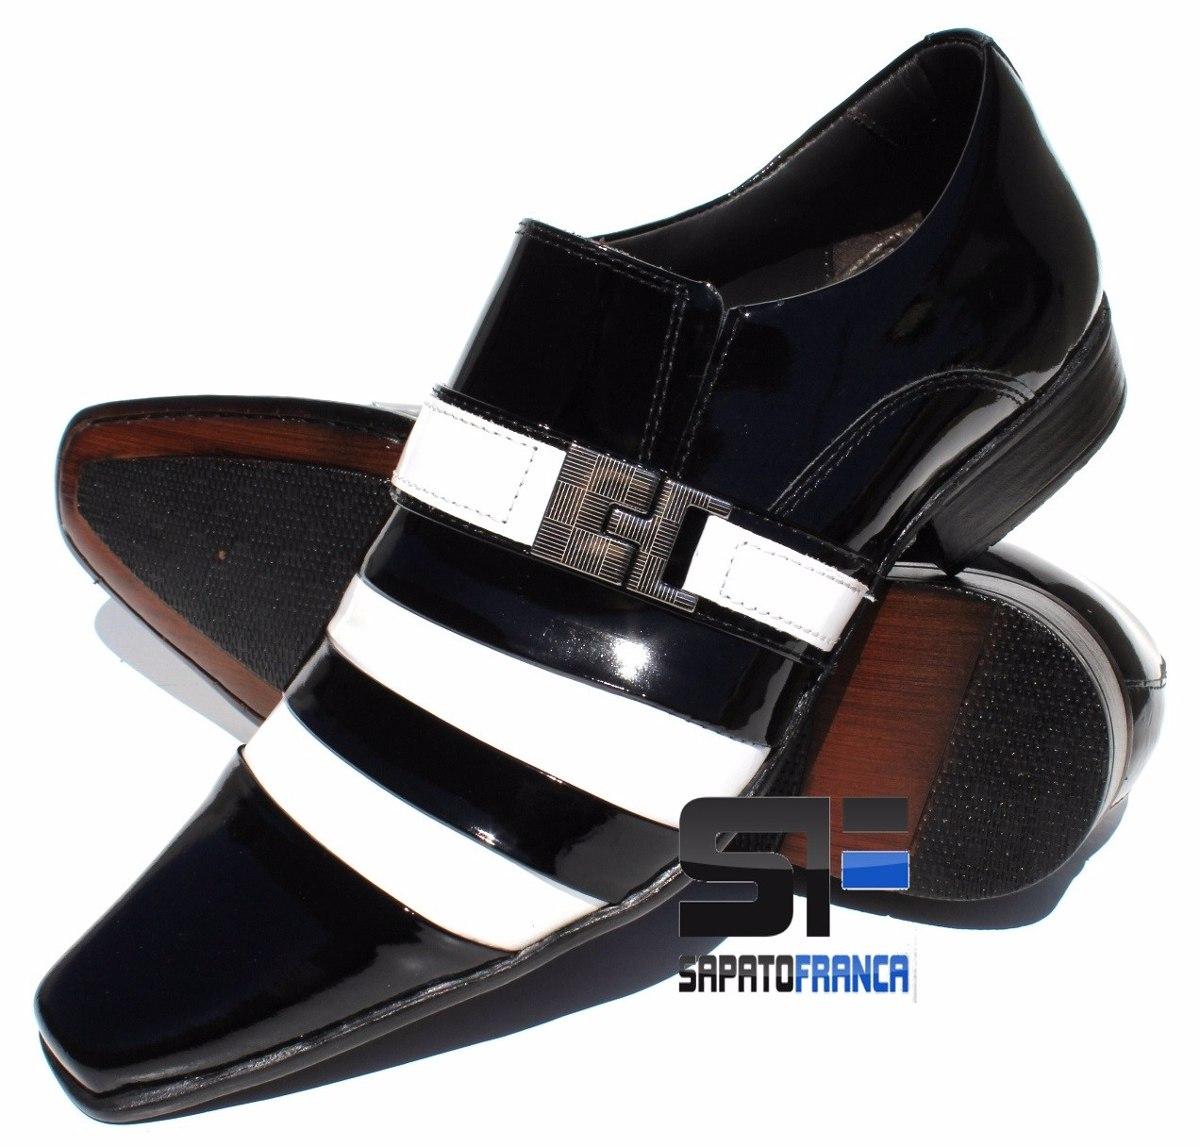 ef3ba0302c sapato social masculino envernizado preto com branco couro. Carregando zoom.